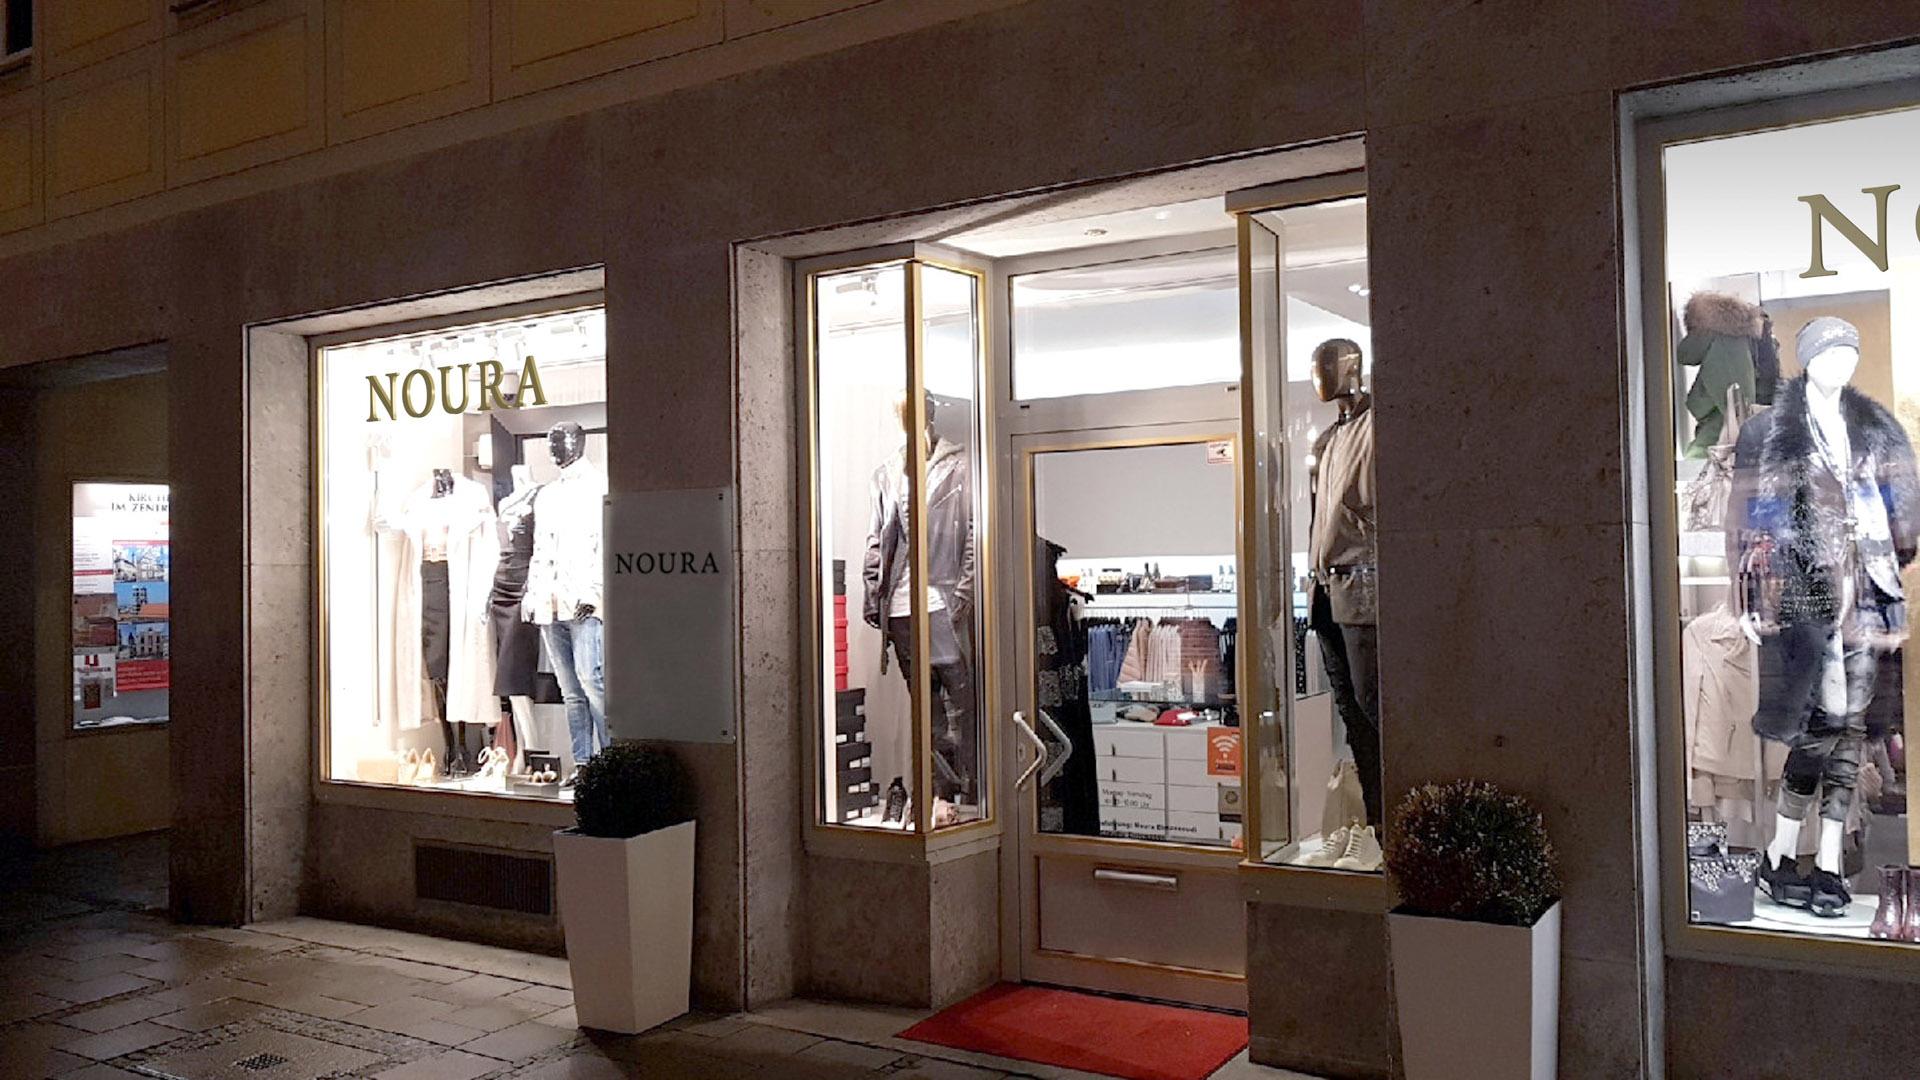 Konzept - NOURA Fashion Boutique Ladenbeschriftung als 3D-Fotomontage